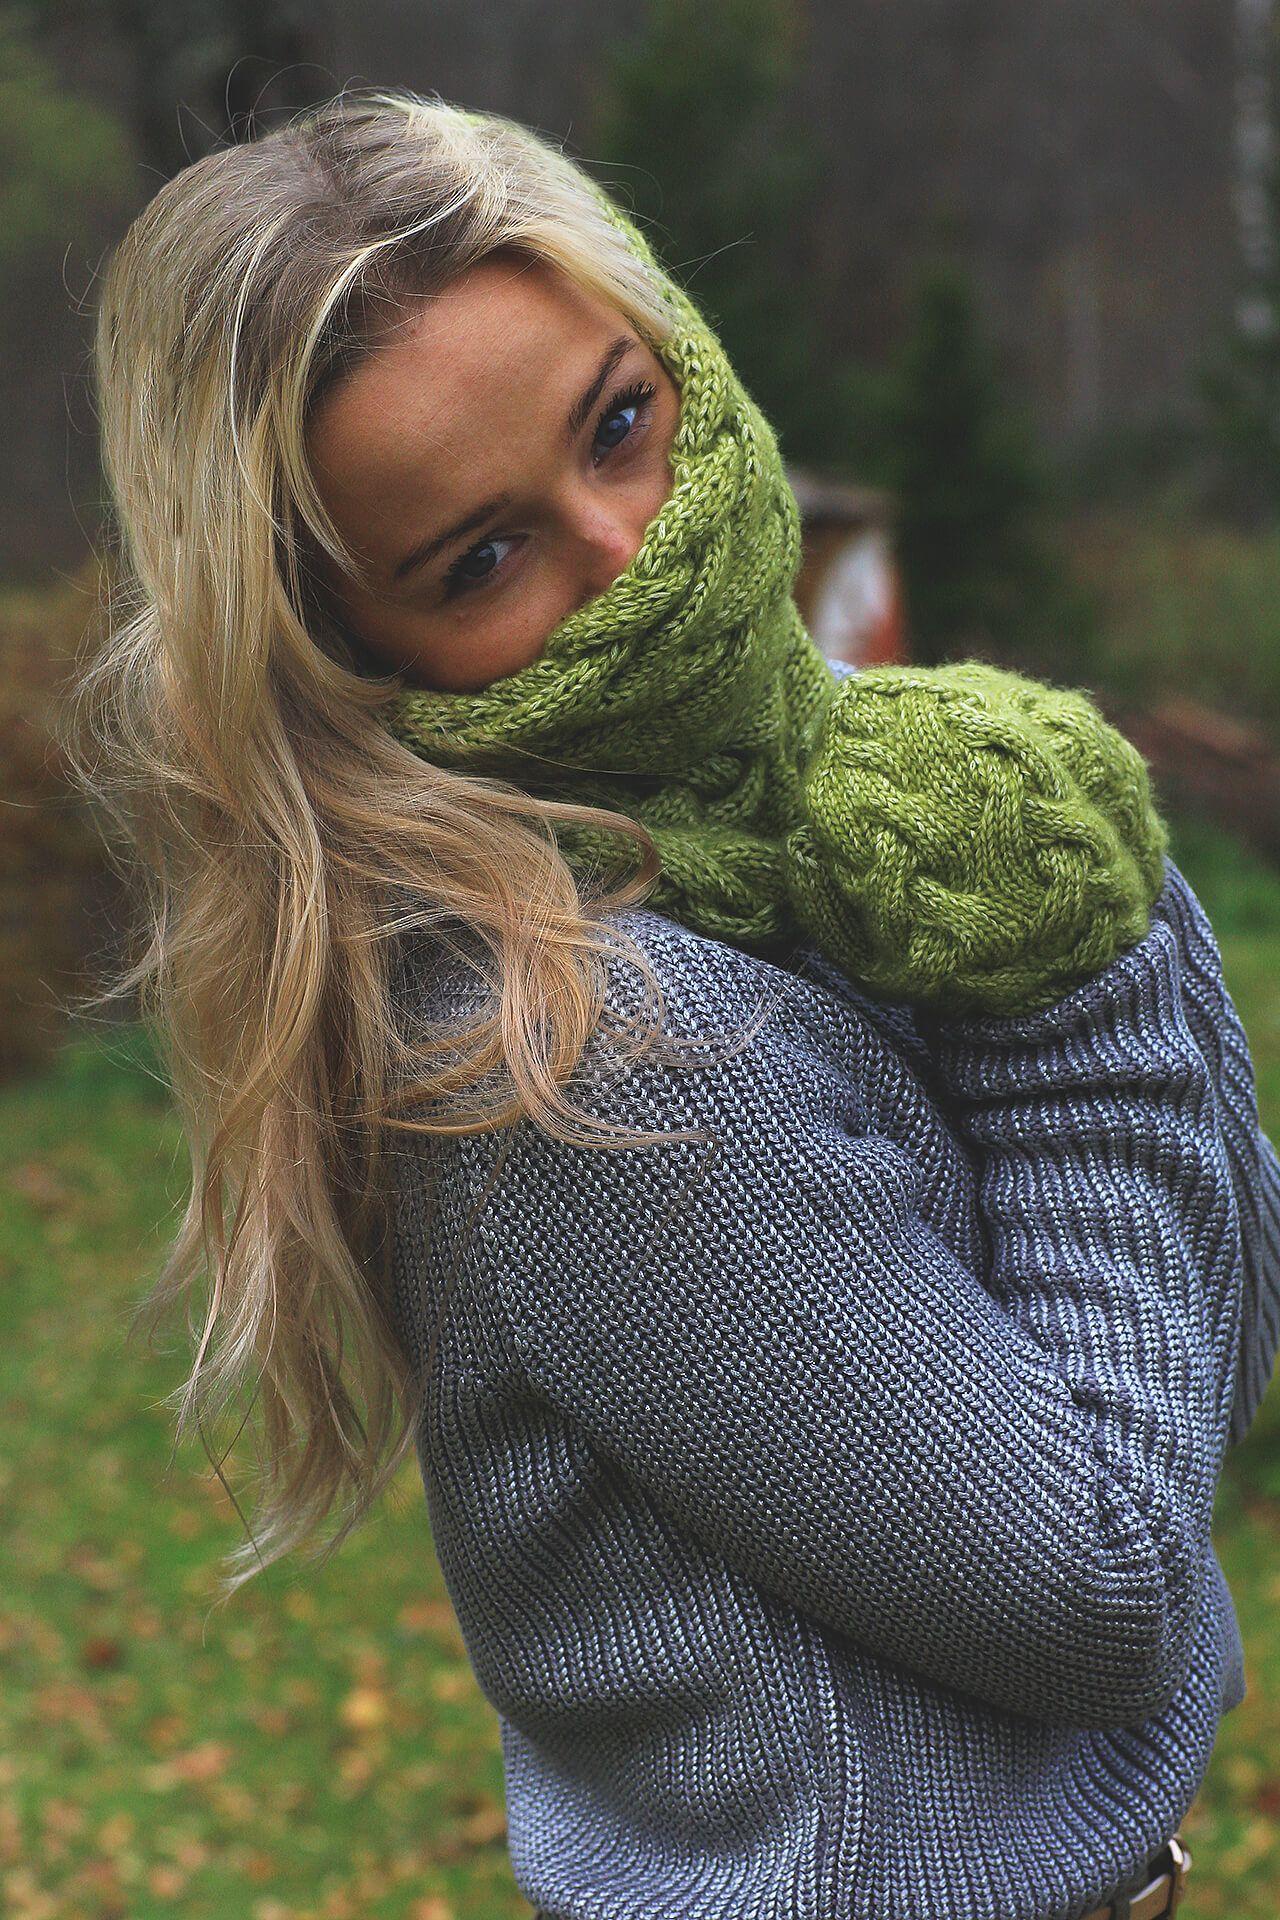 194cf3e5b27 ... handmade   merino  winter  green  hat  autumn  fall  blonde  girl   snood  tubescarf  scarf  infinityscarf  mittens  fashion  outfit  2016   2017  trendy ...